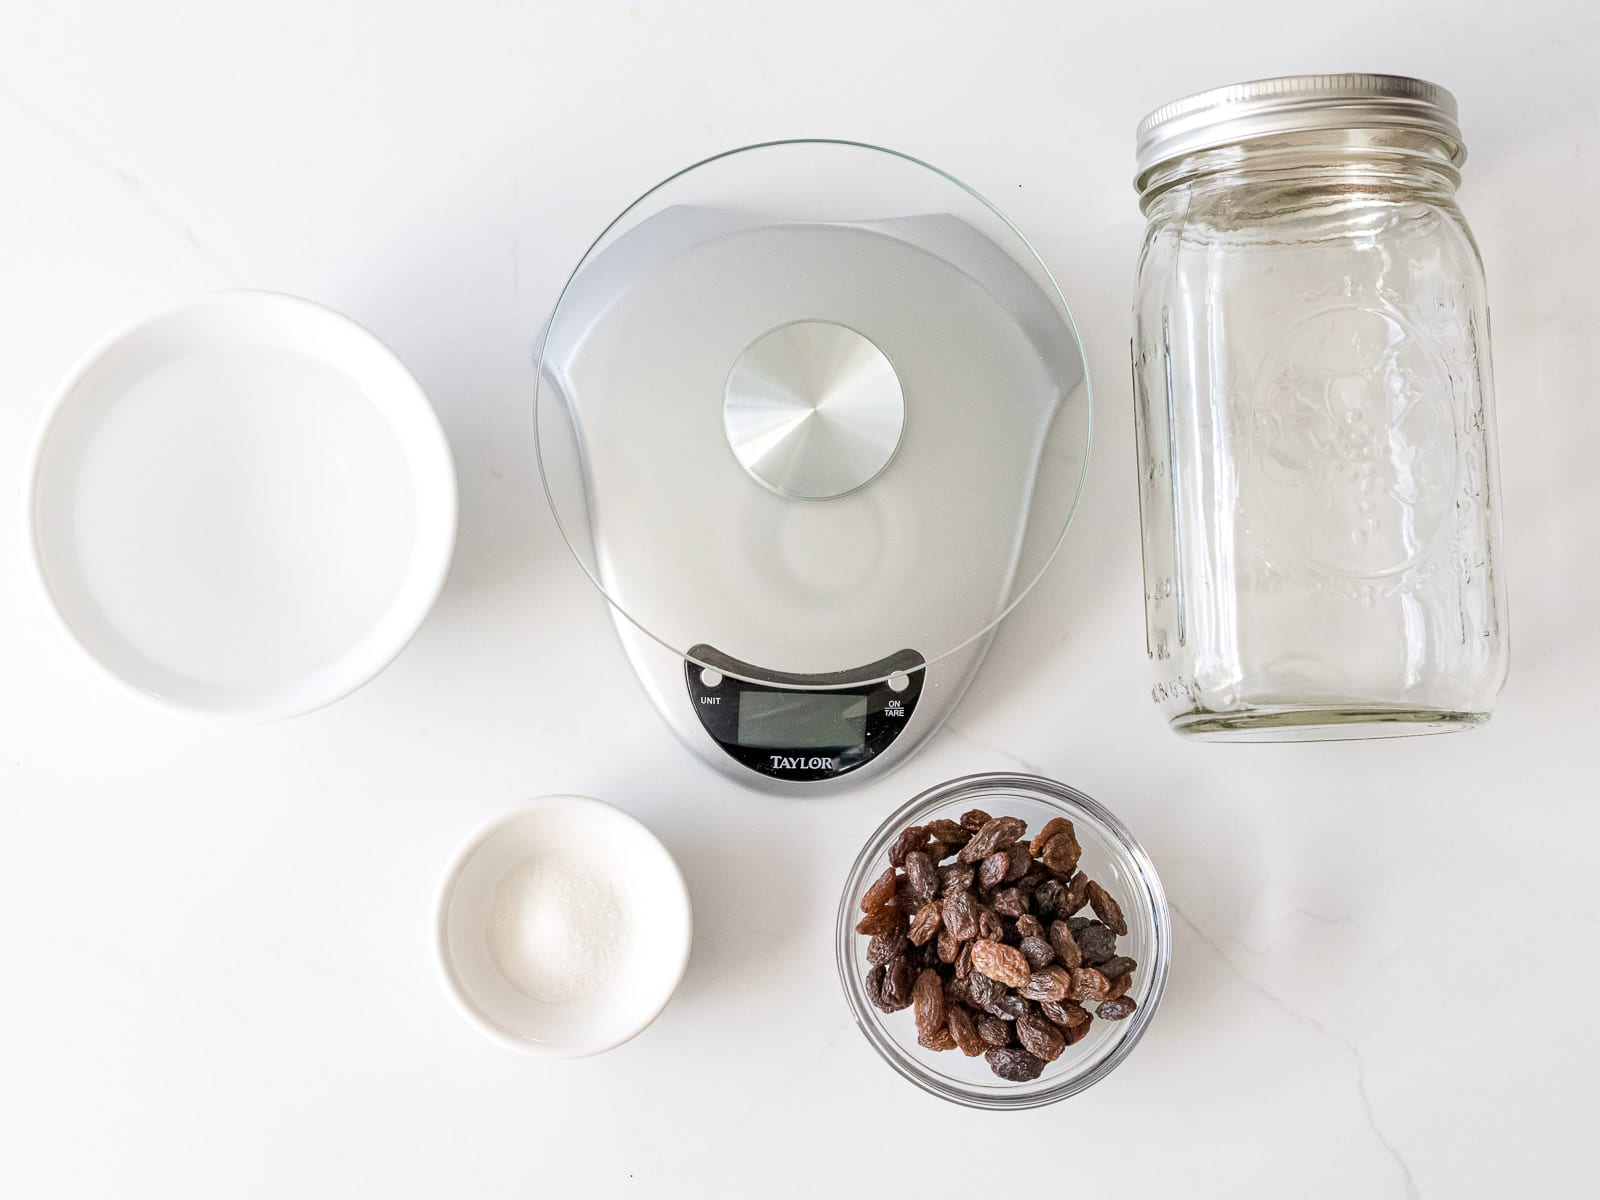 ingredients for raisin yeast water including raisins, kitchen scale, mason jar, water, and sugar